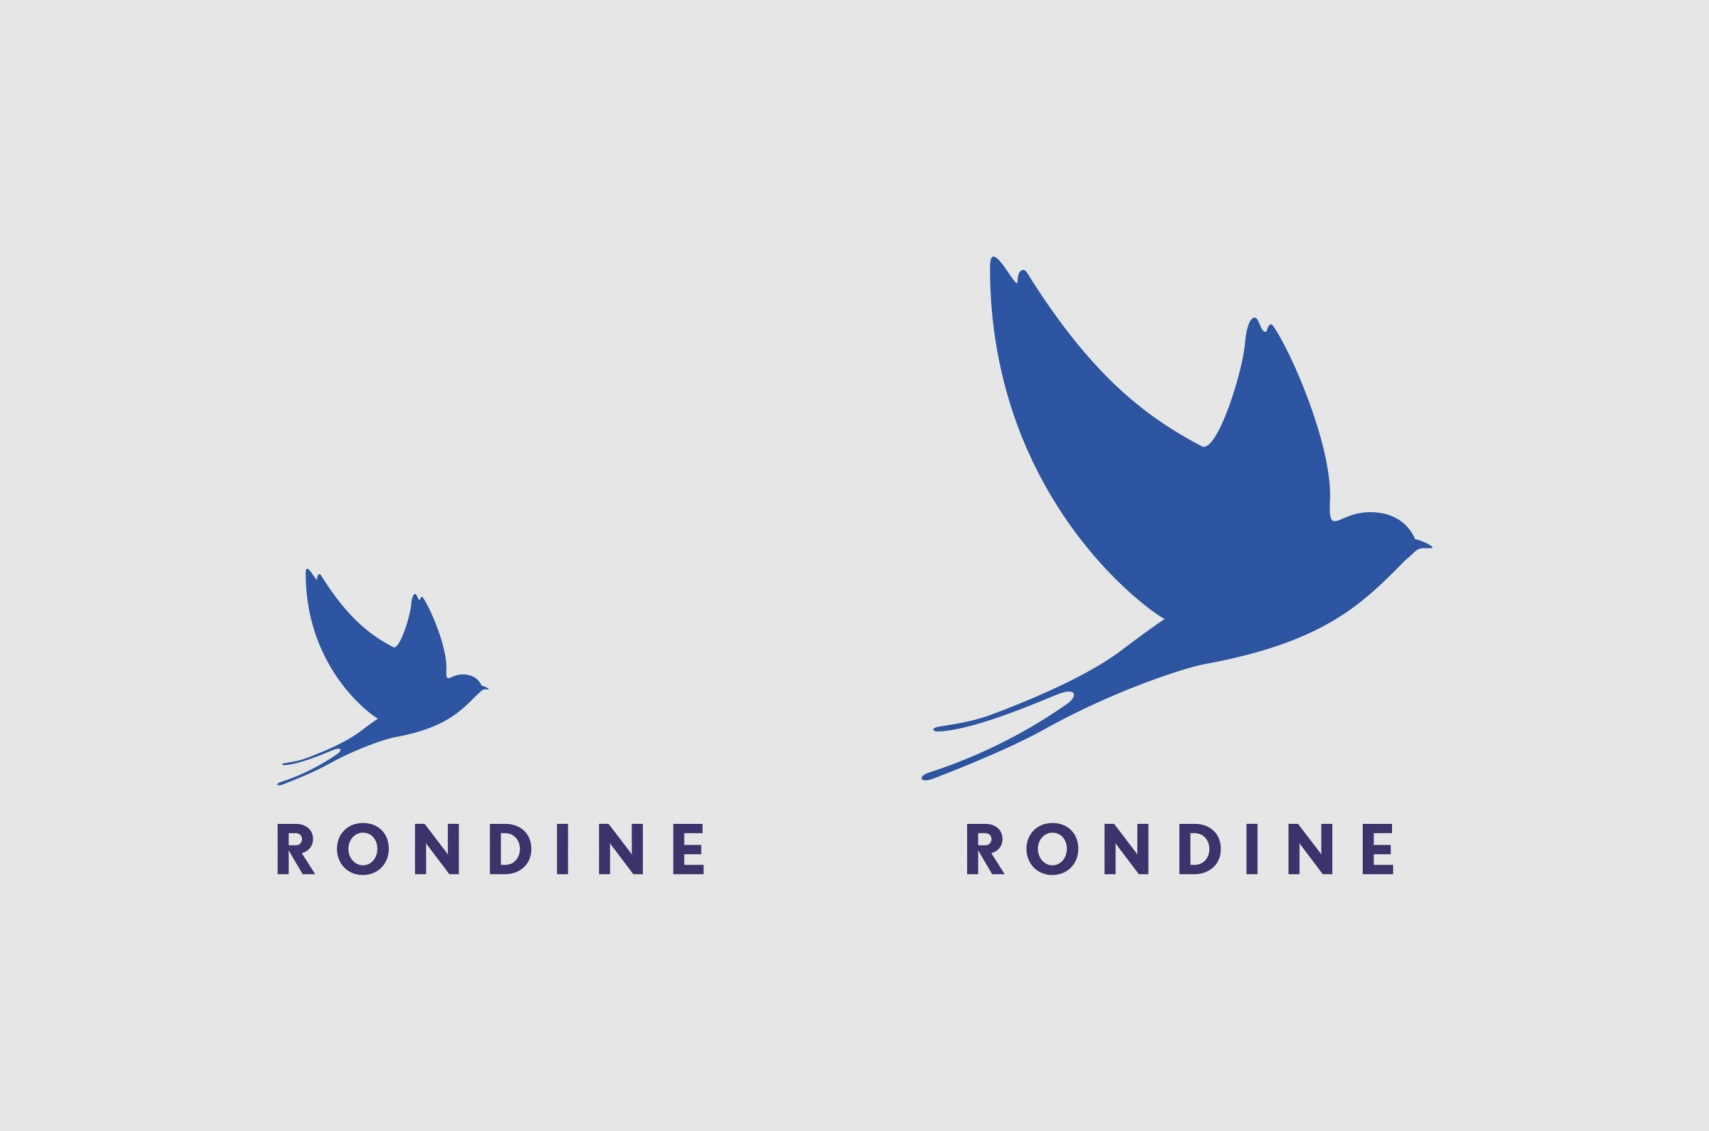 Rondine_1a_Logo.jpg